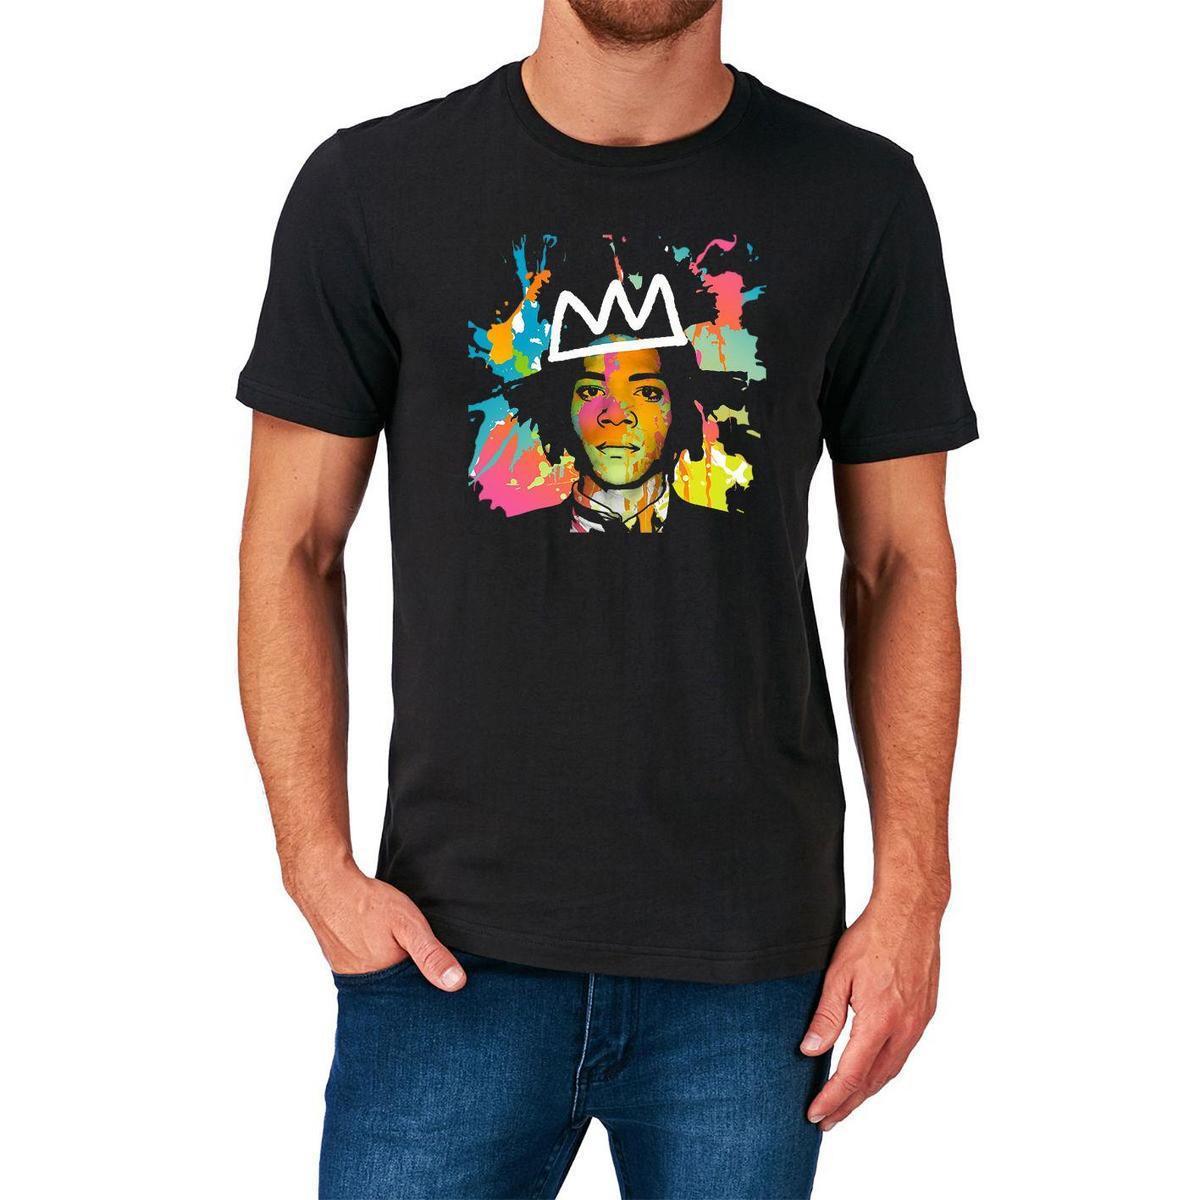 Jean michel basquiat t shirt graffiti new york 70s 80s 90s white designer t shirts clever t shirt from yuxin04 13 8 dhgate com